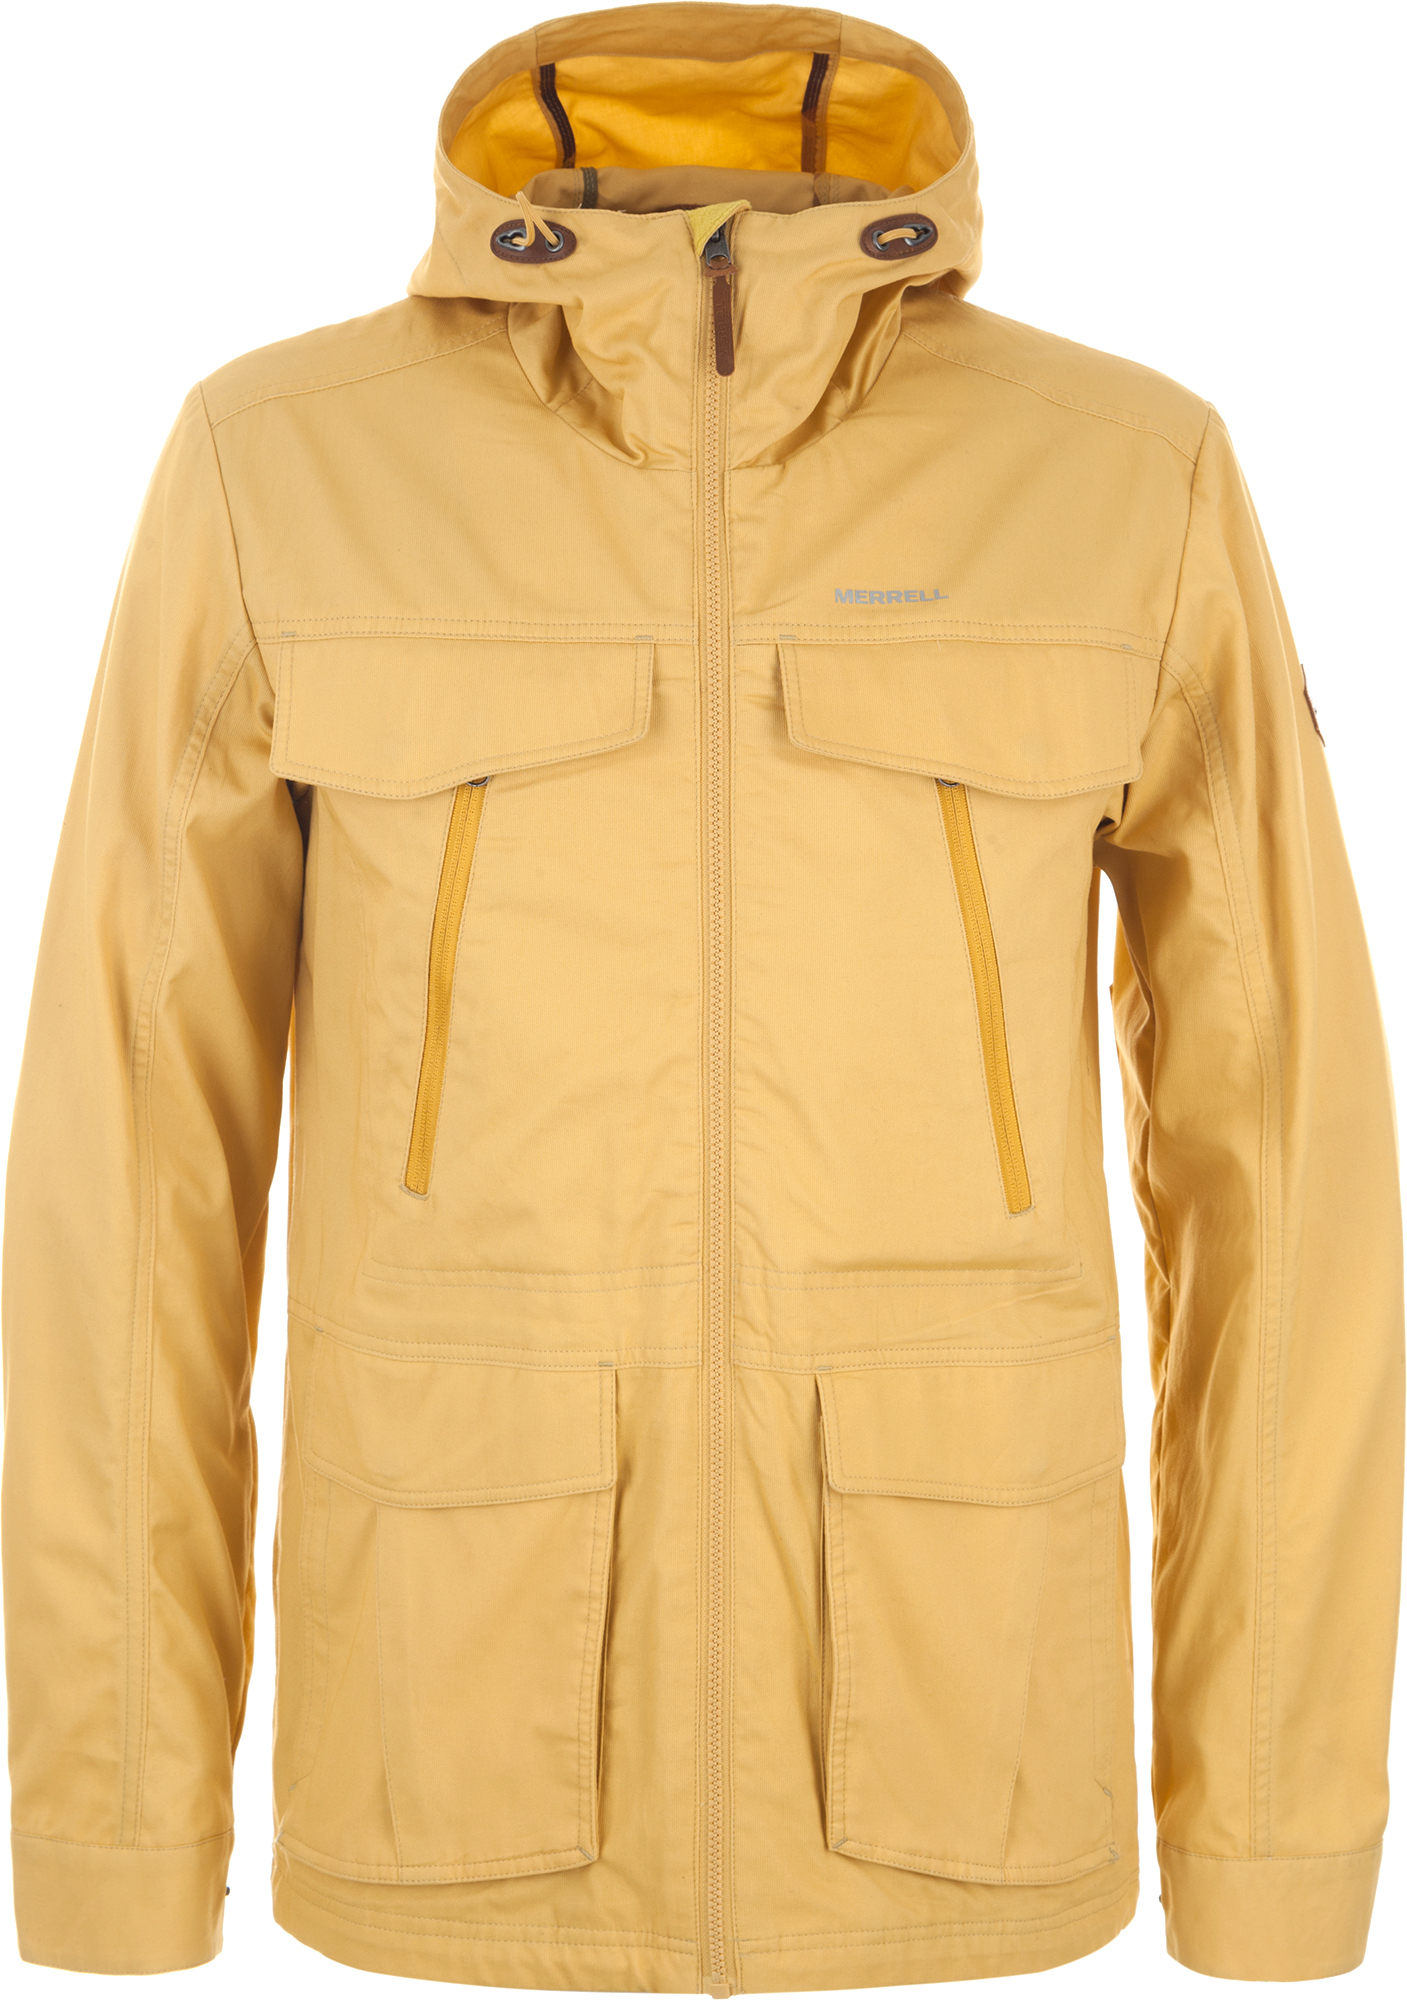 Merrell Ветровка мужская Merrell, размер 56 ветровка мужская stayer цвет желтый 41616 60 размер 56 188